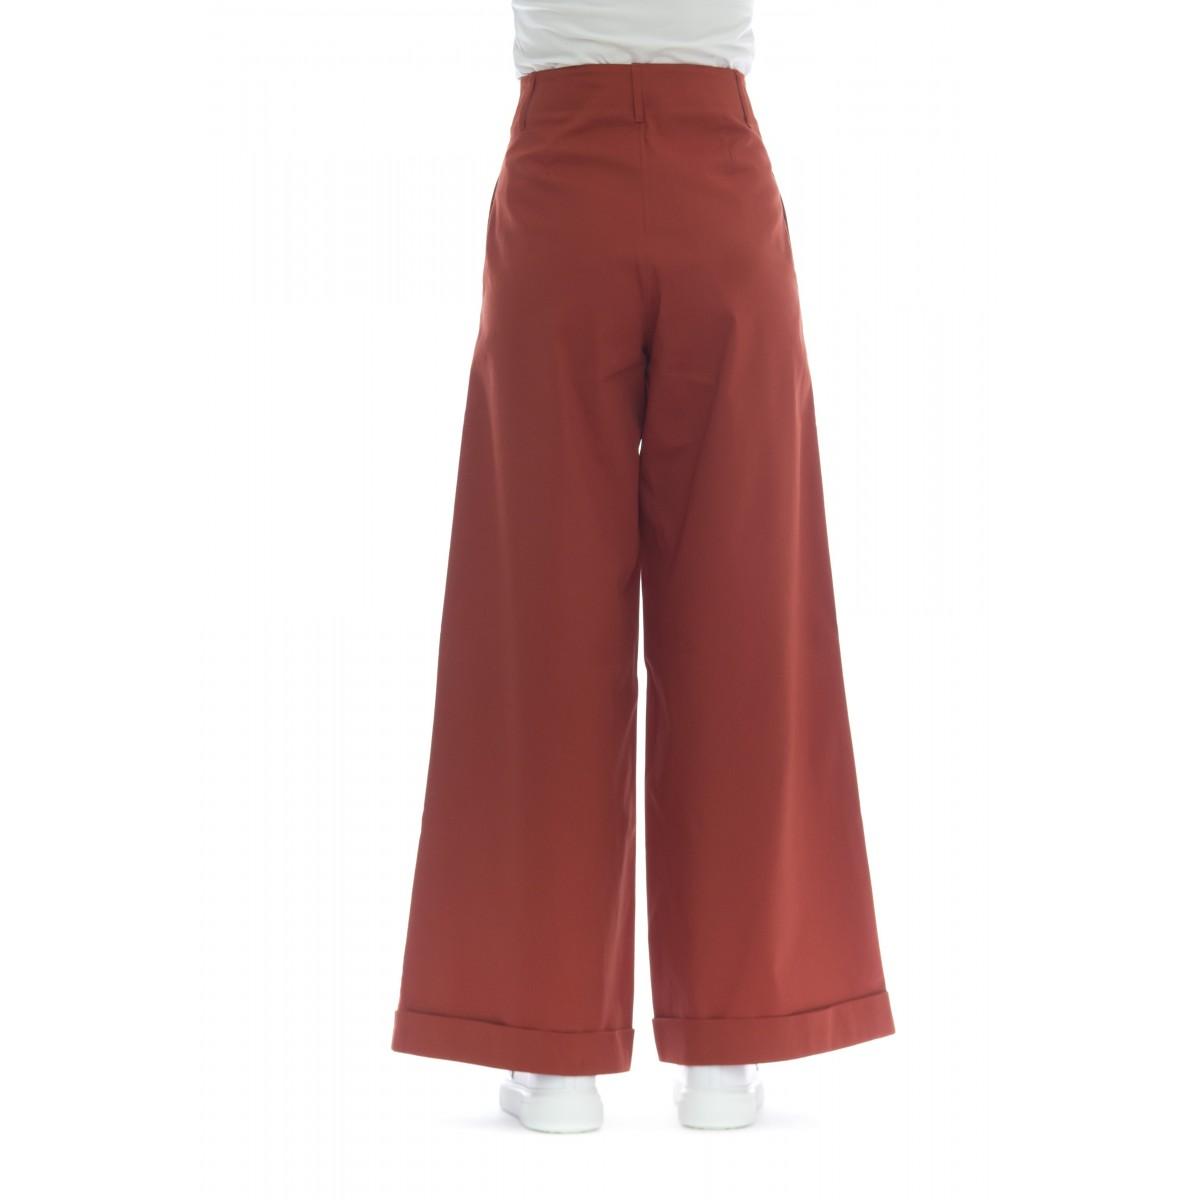 Pantalone donna - C60461 pantalone vita alta palazzo